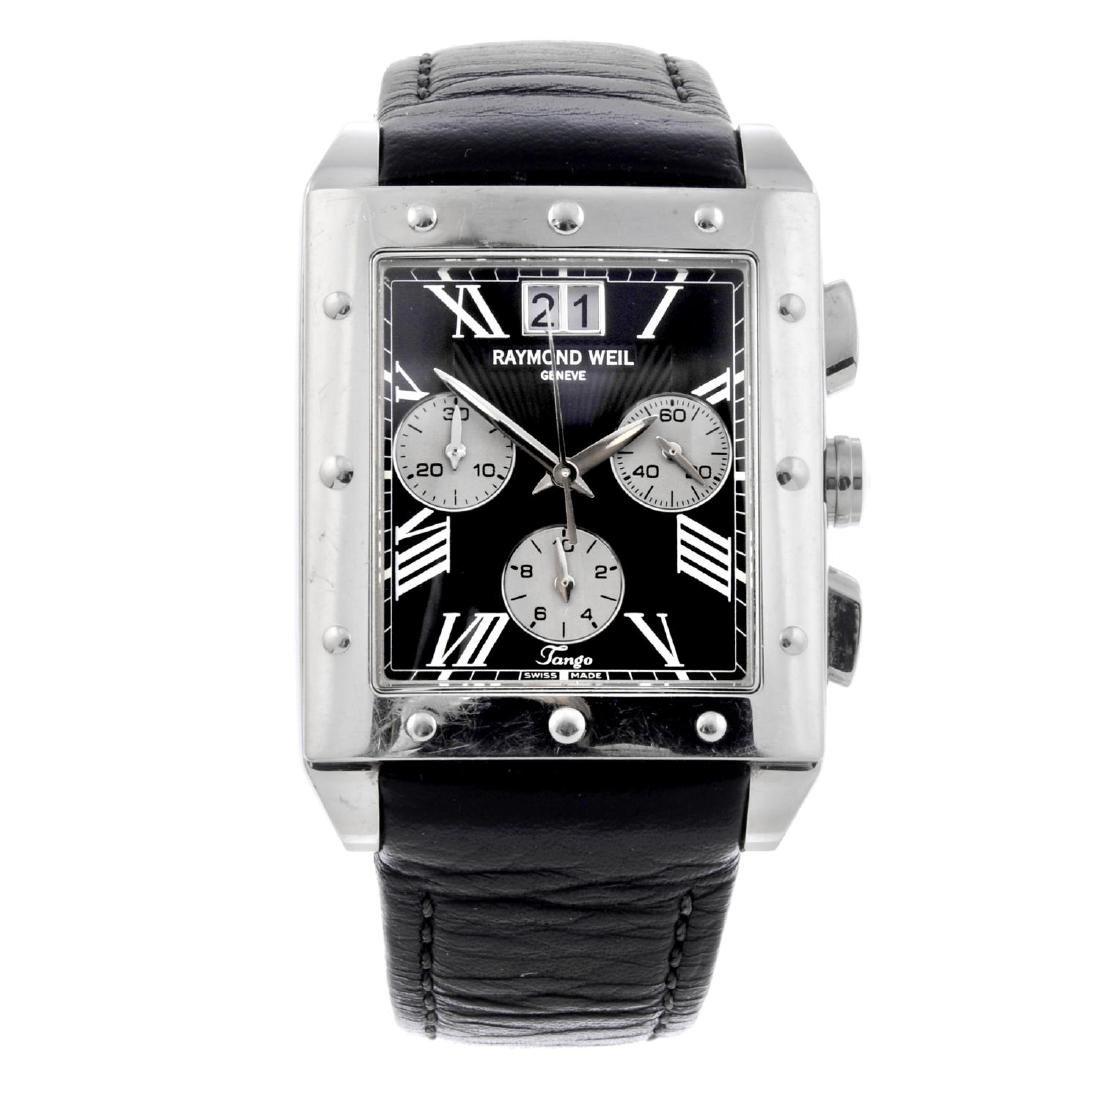 RAYMOND WEIL - a gentleman's Tango chronograph wrist